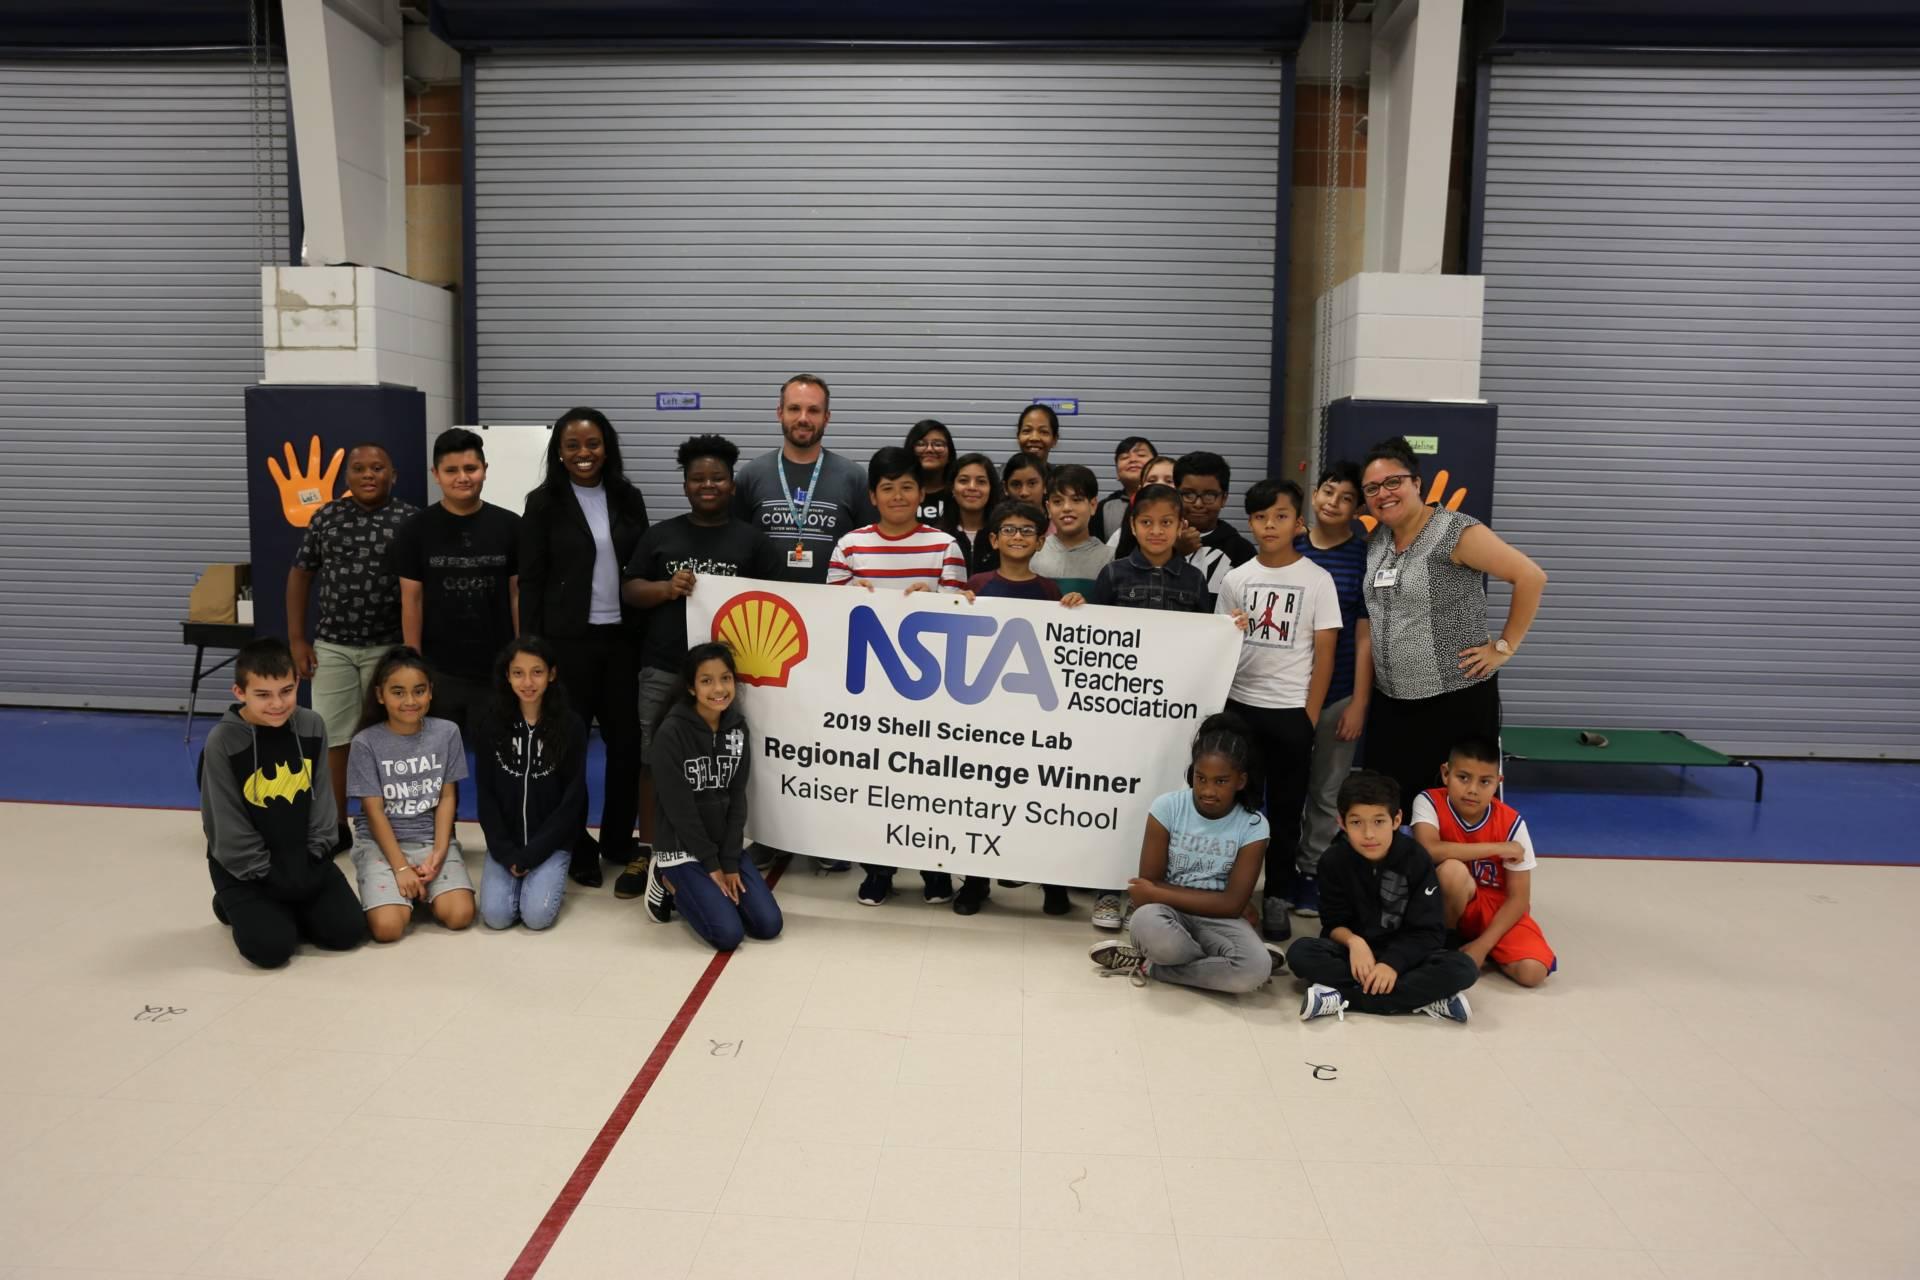 Elementary Science Teacher Wins Shell Science Lab Regional Challenge